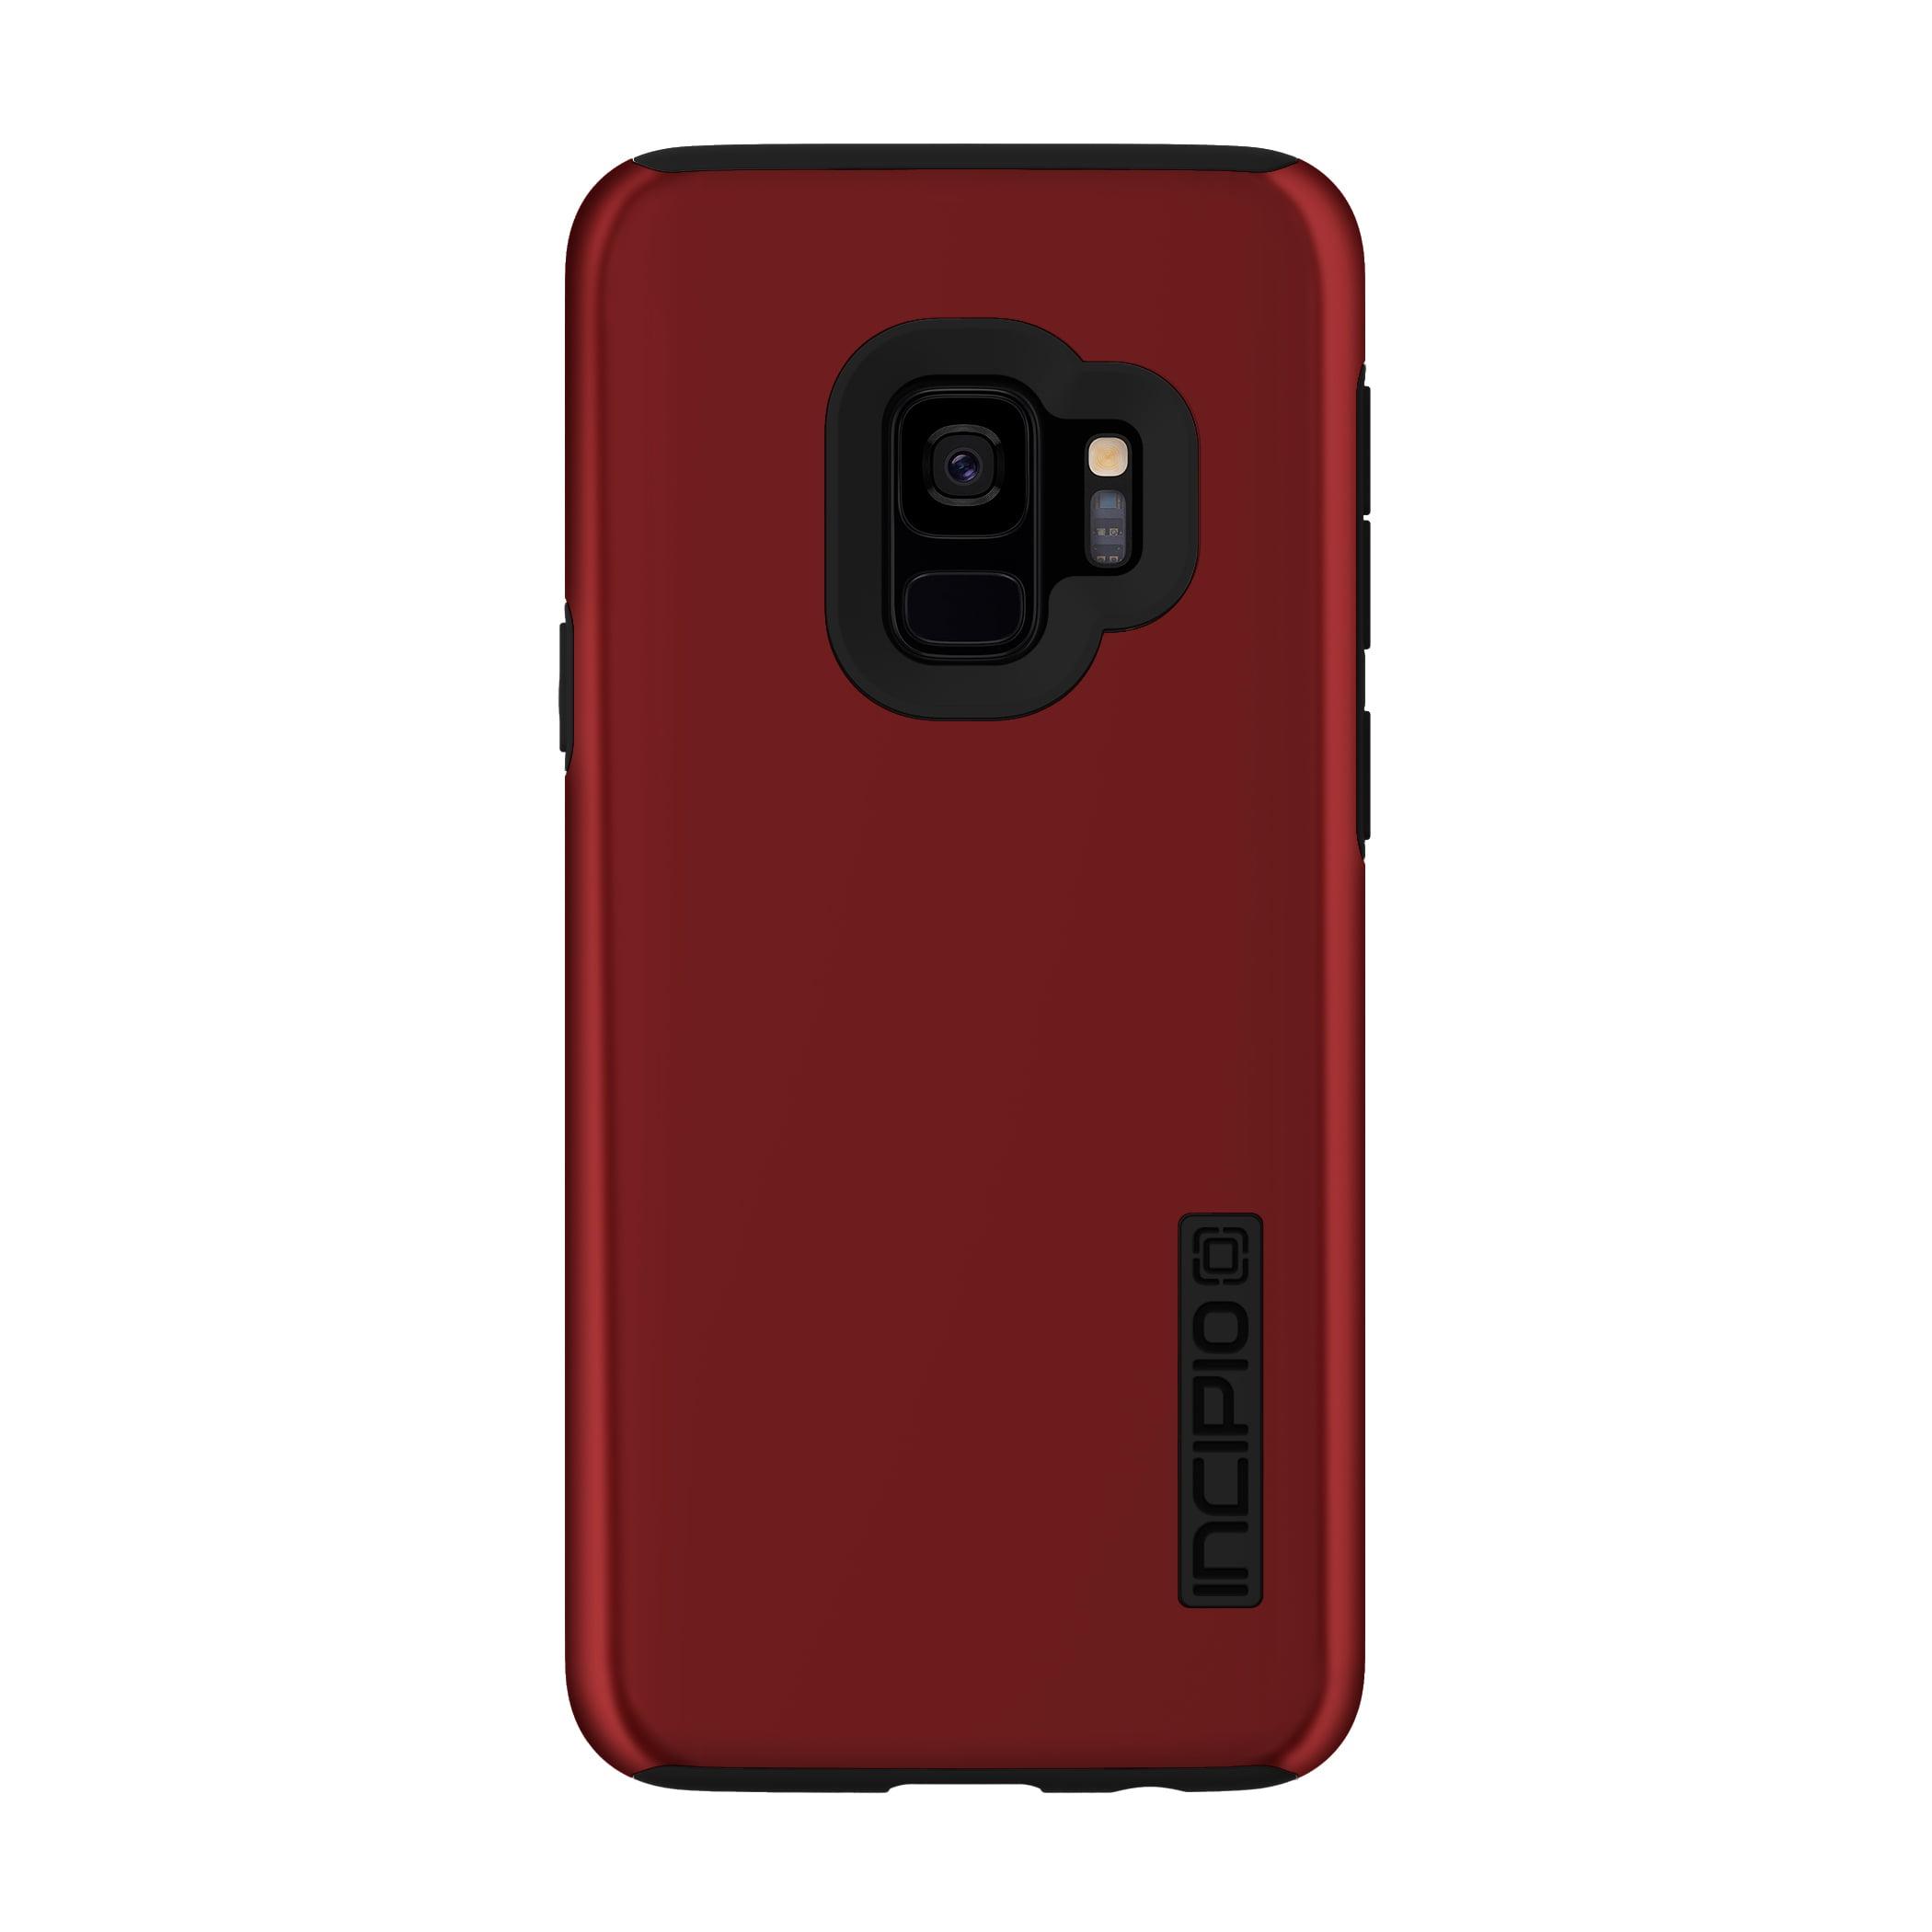 Incipio DualPro Case for Samsung GS9 - Iridescent Red / Black